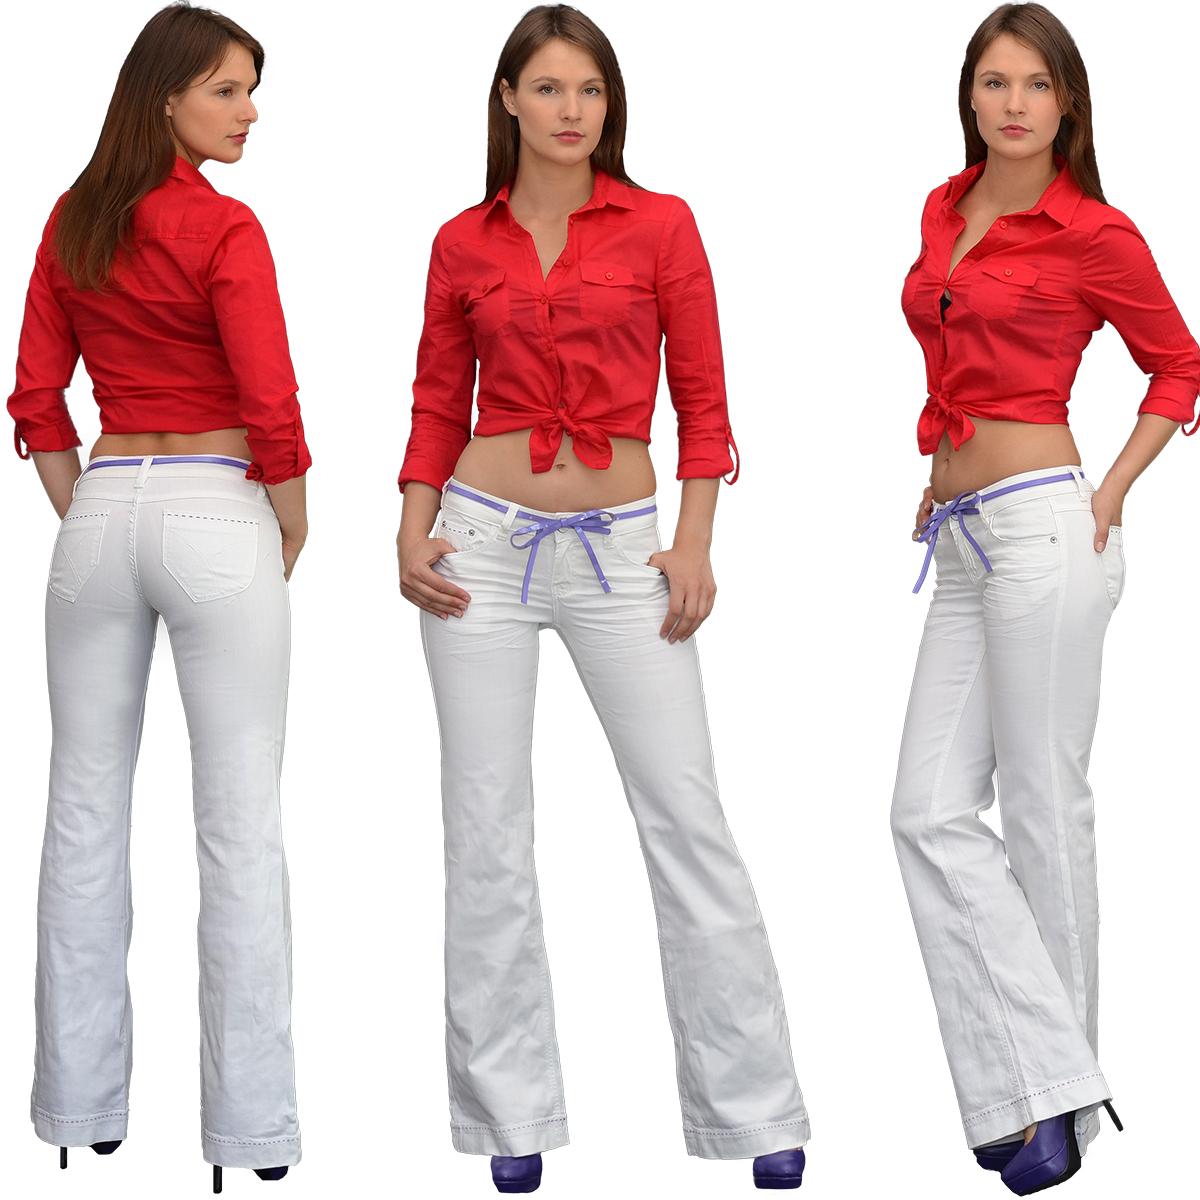 damen bootcut jeans damen jeanshose bootcut schlaghose. Black Bedroom Furniture Sets. Home Design Ideas